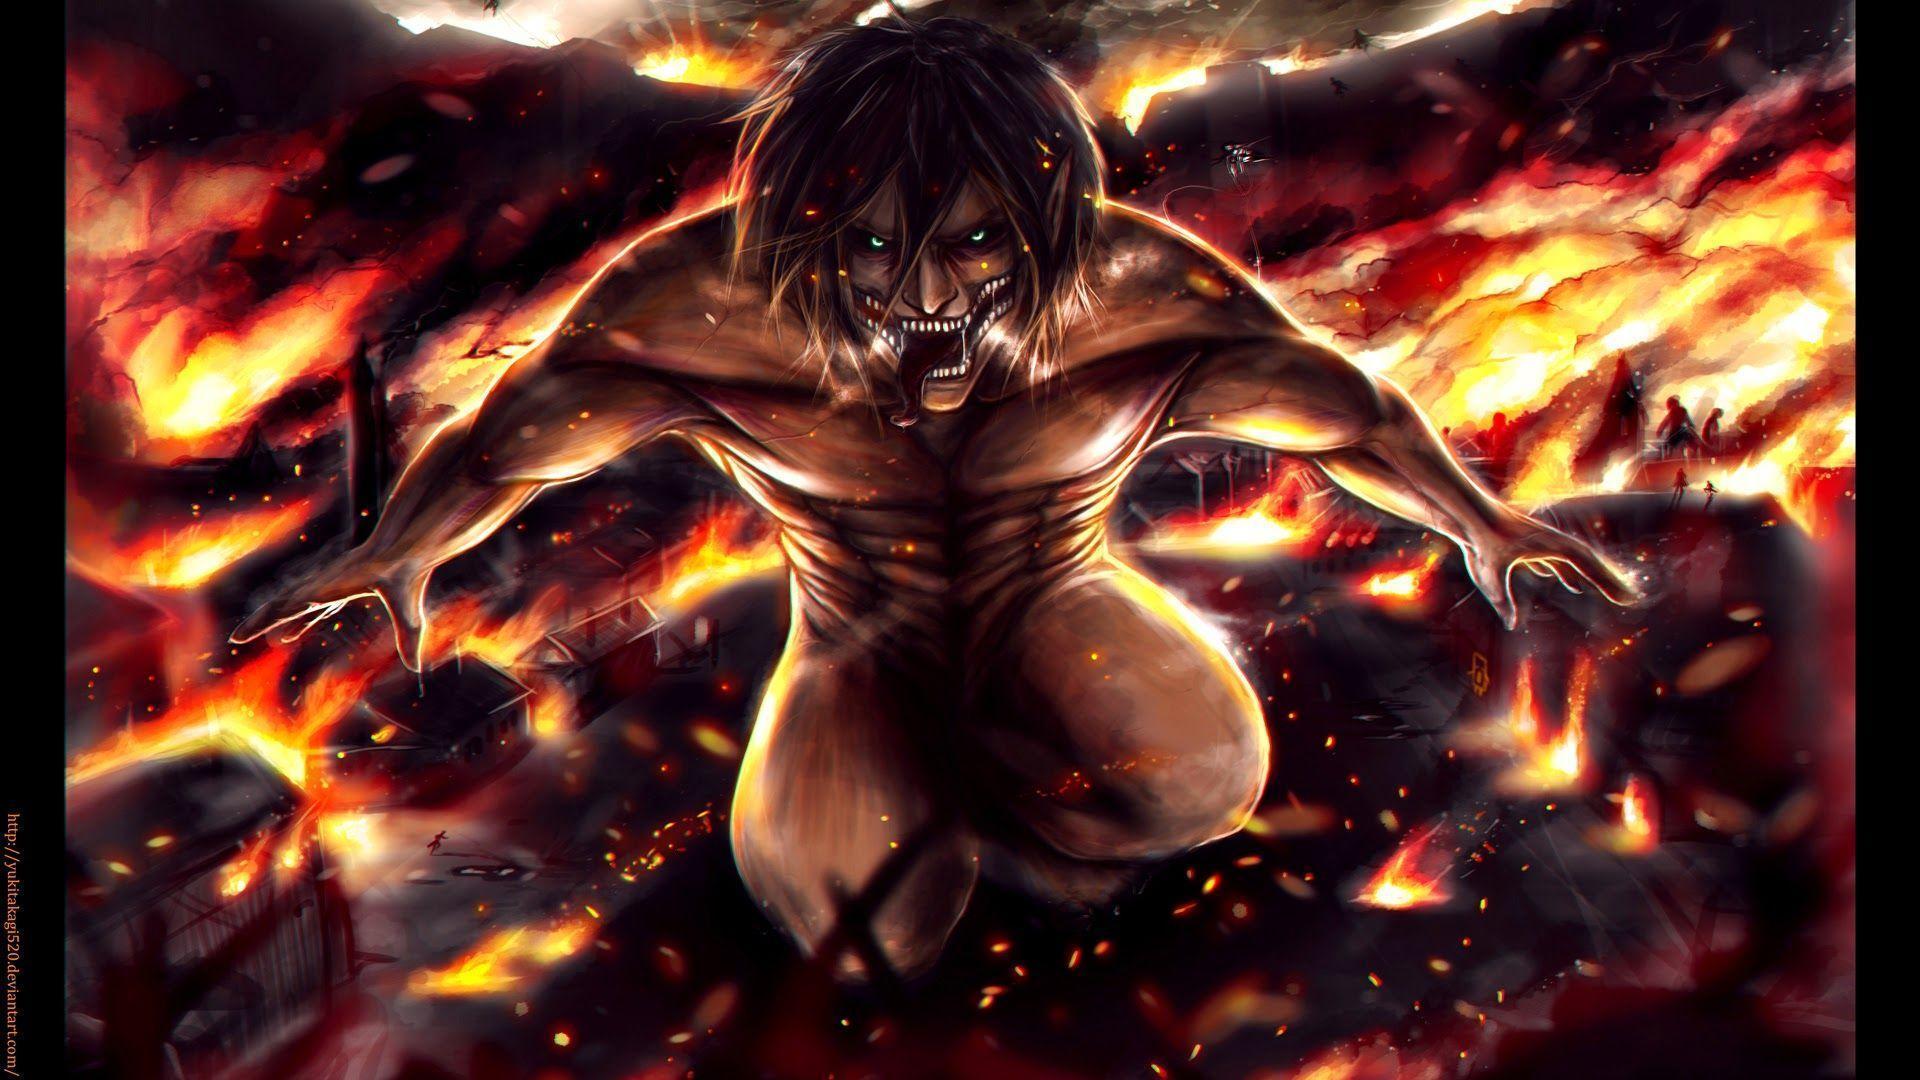 Anime aot shingeki no kyojin manga attack on titan characters eren jaeger eren levi mikasa mikasa ackerman green eyes fire snk. Eren Yeager Wallpapers - Wallpaper Cave